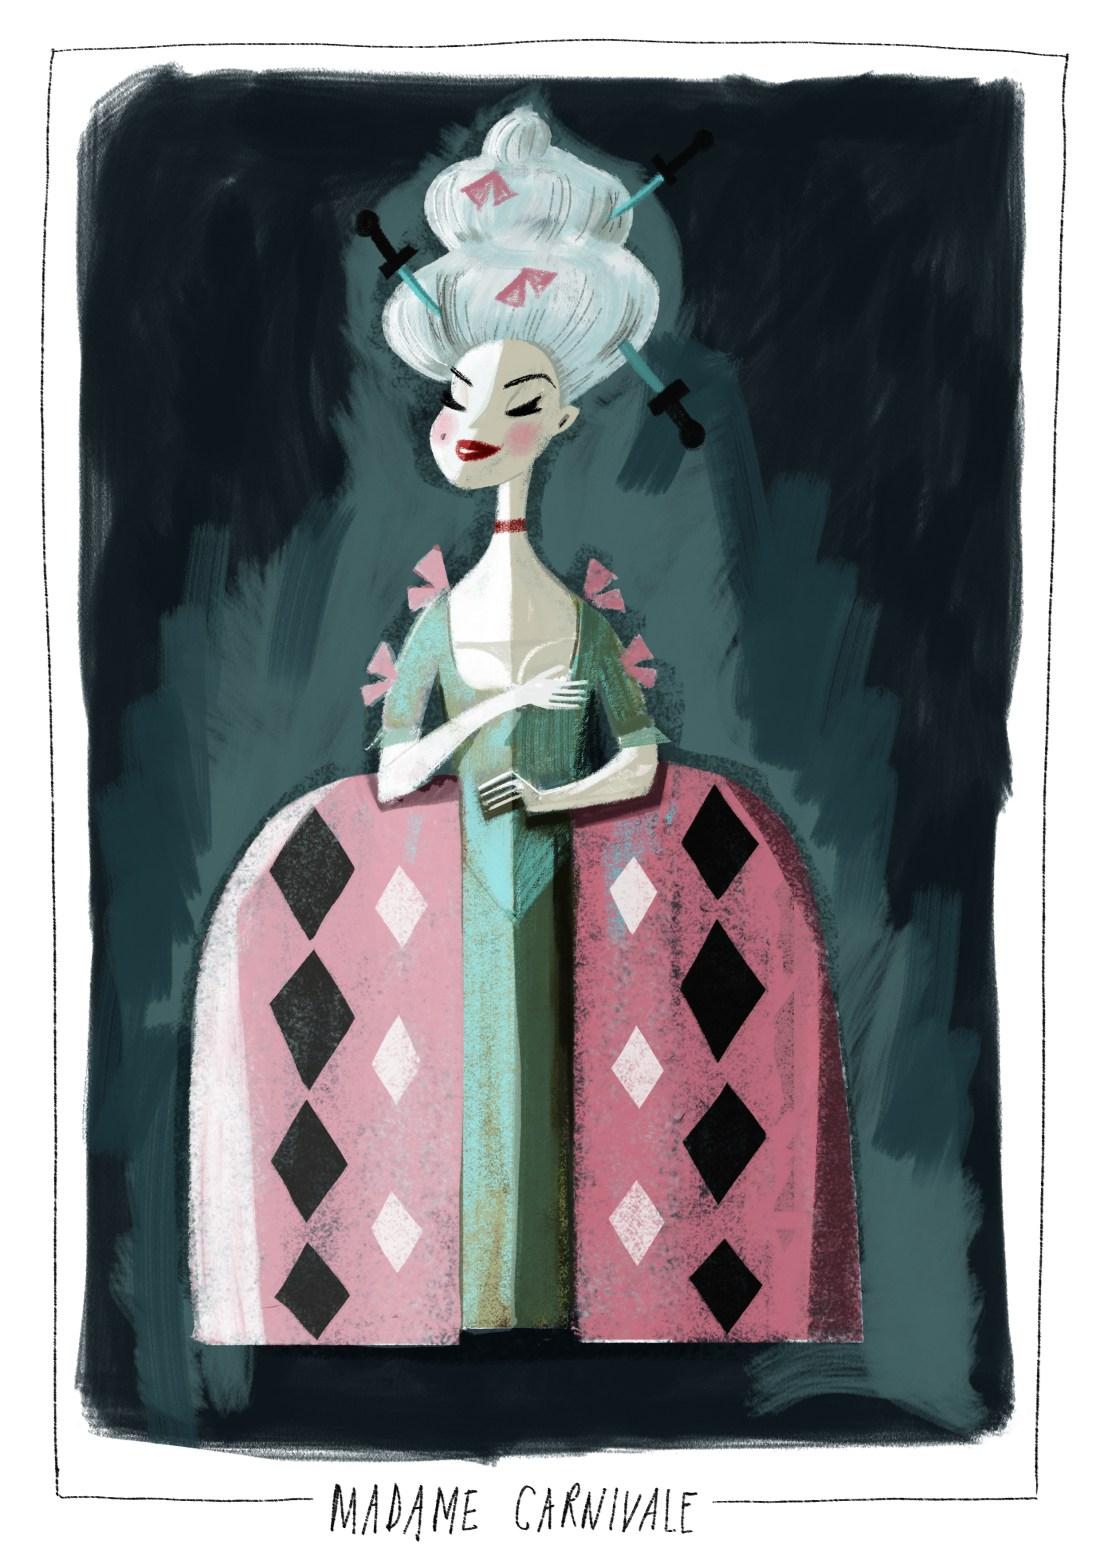 madame carnivale_.jpg